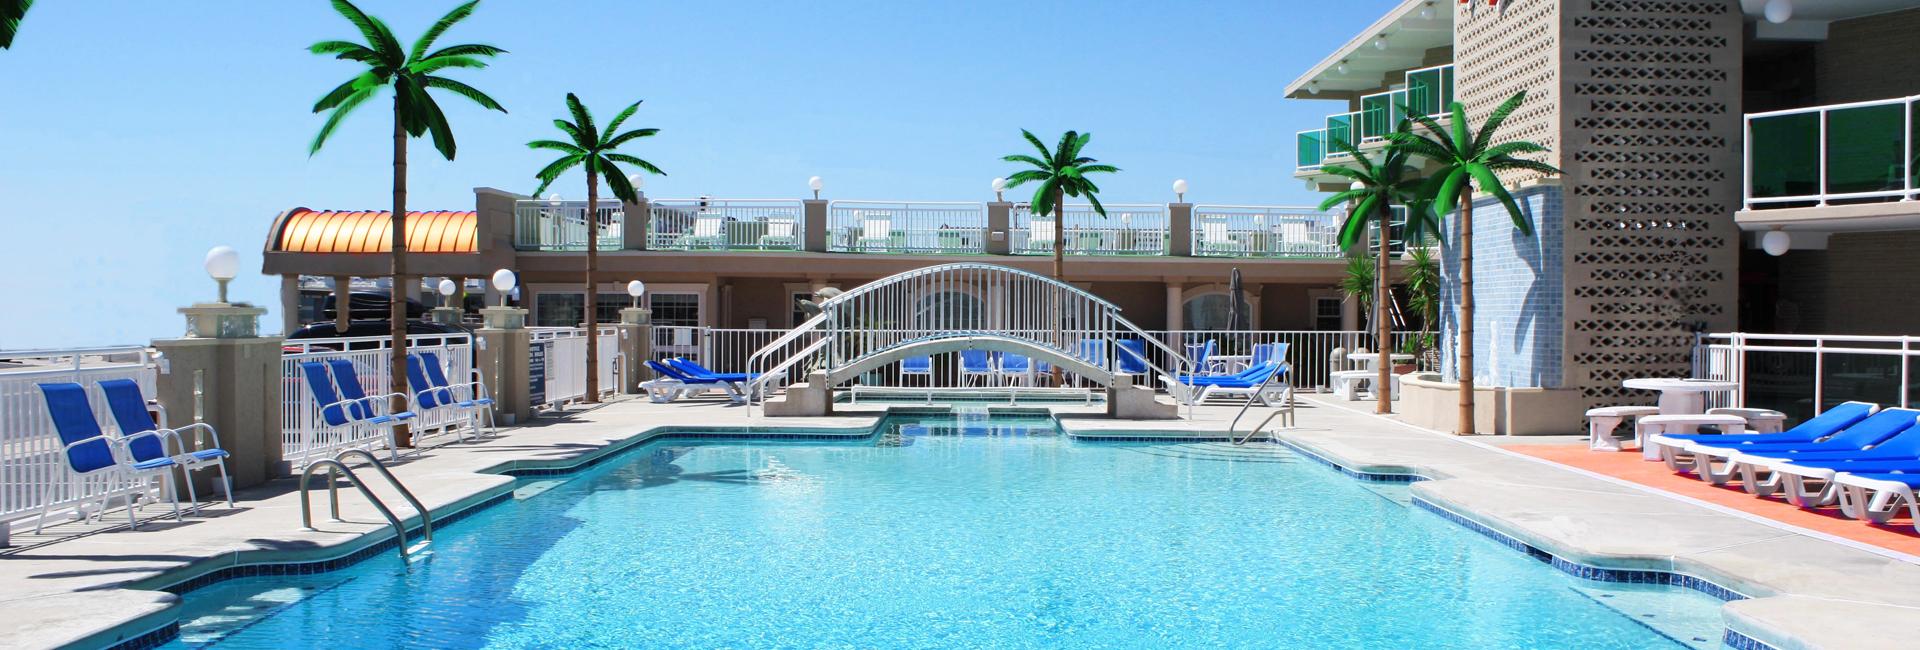 Pan american hotel wildwood crest nj - Unwind In Largest Pool On Island